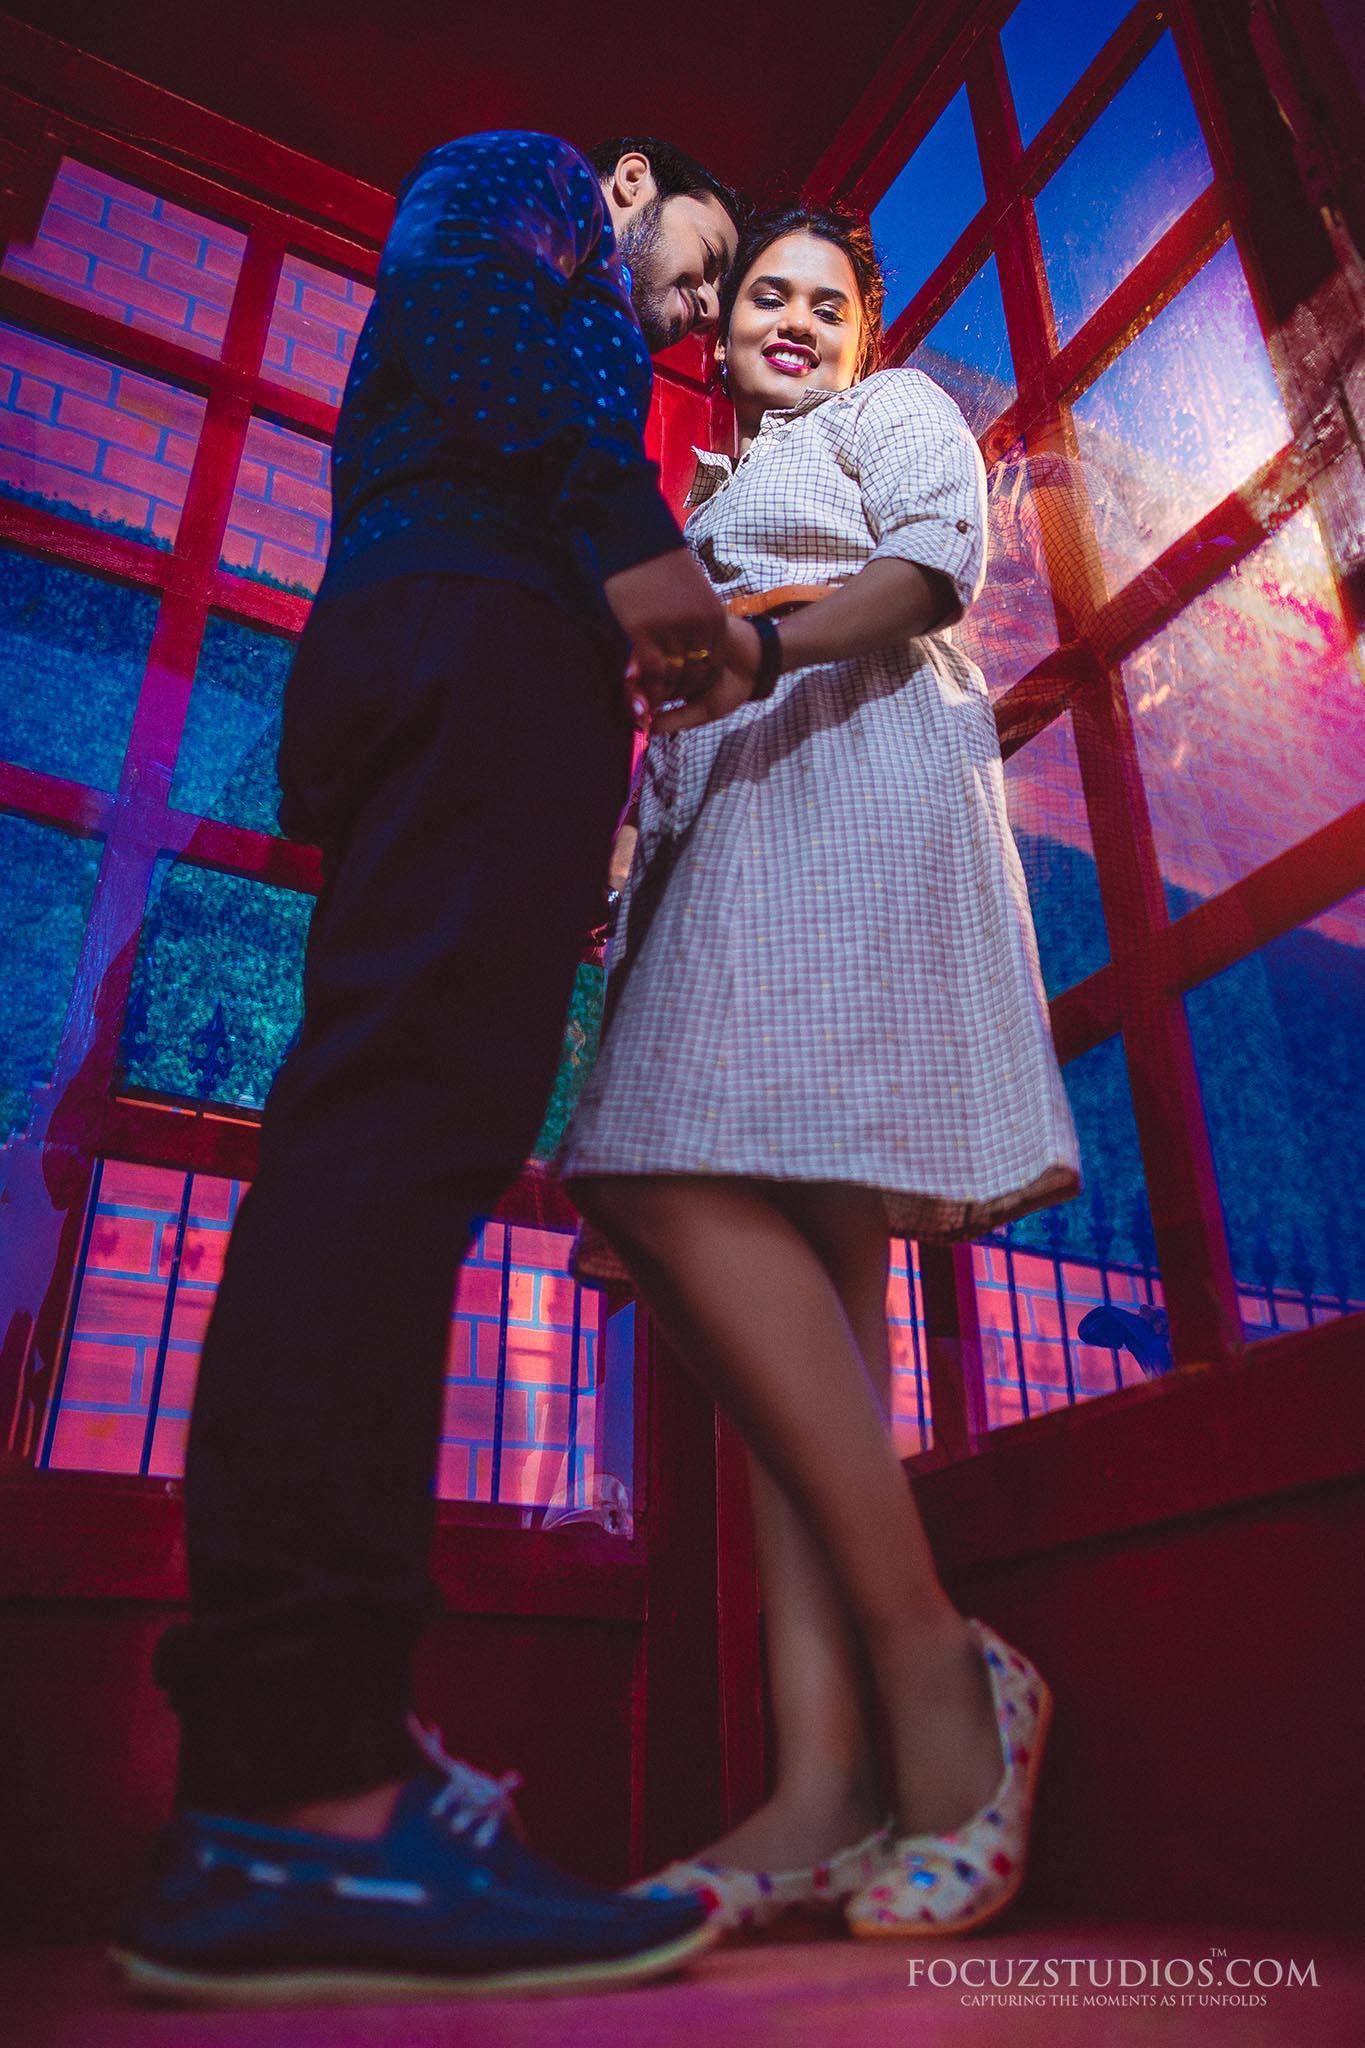 PicturesQ-Studio-focuz-studio-hyderabad-pre-wedding-shoot-18